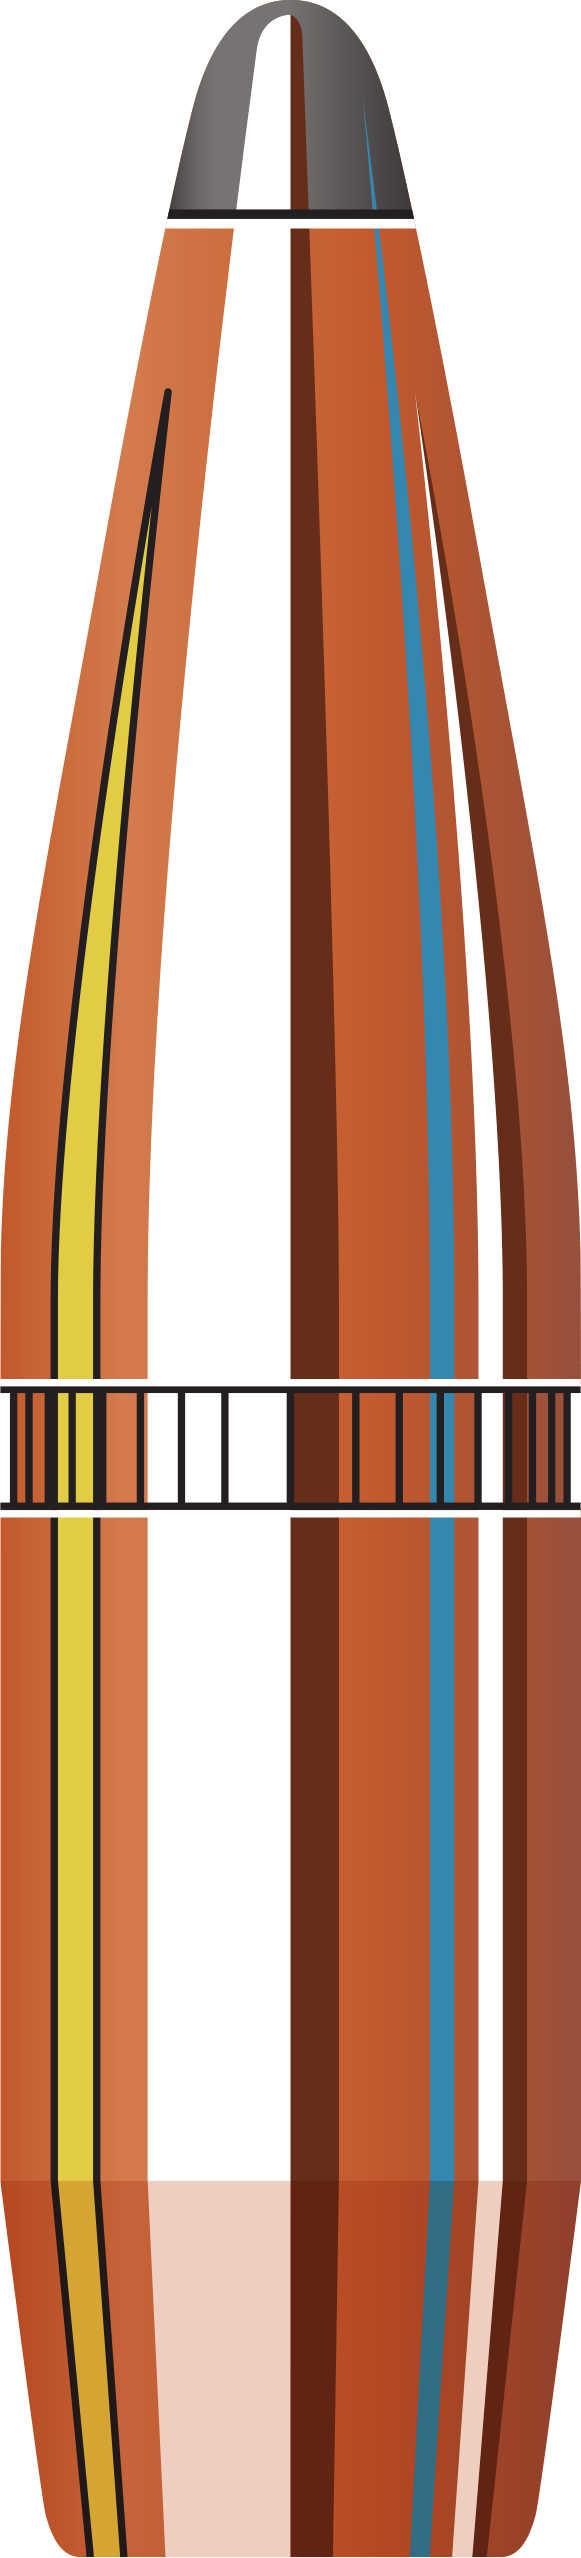 Hornady 270 Caliber InterLock Bullets 140 Grain Spire Point Boat Tail (Per 100) 2735